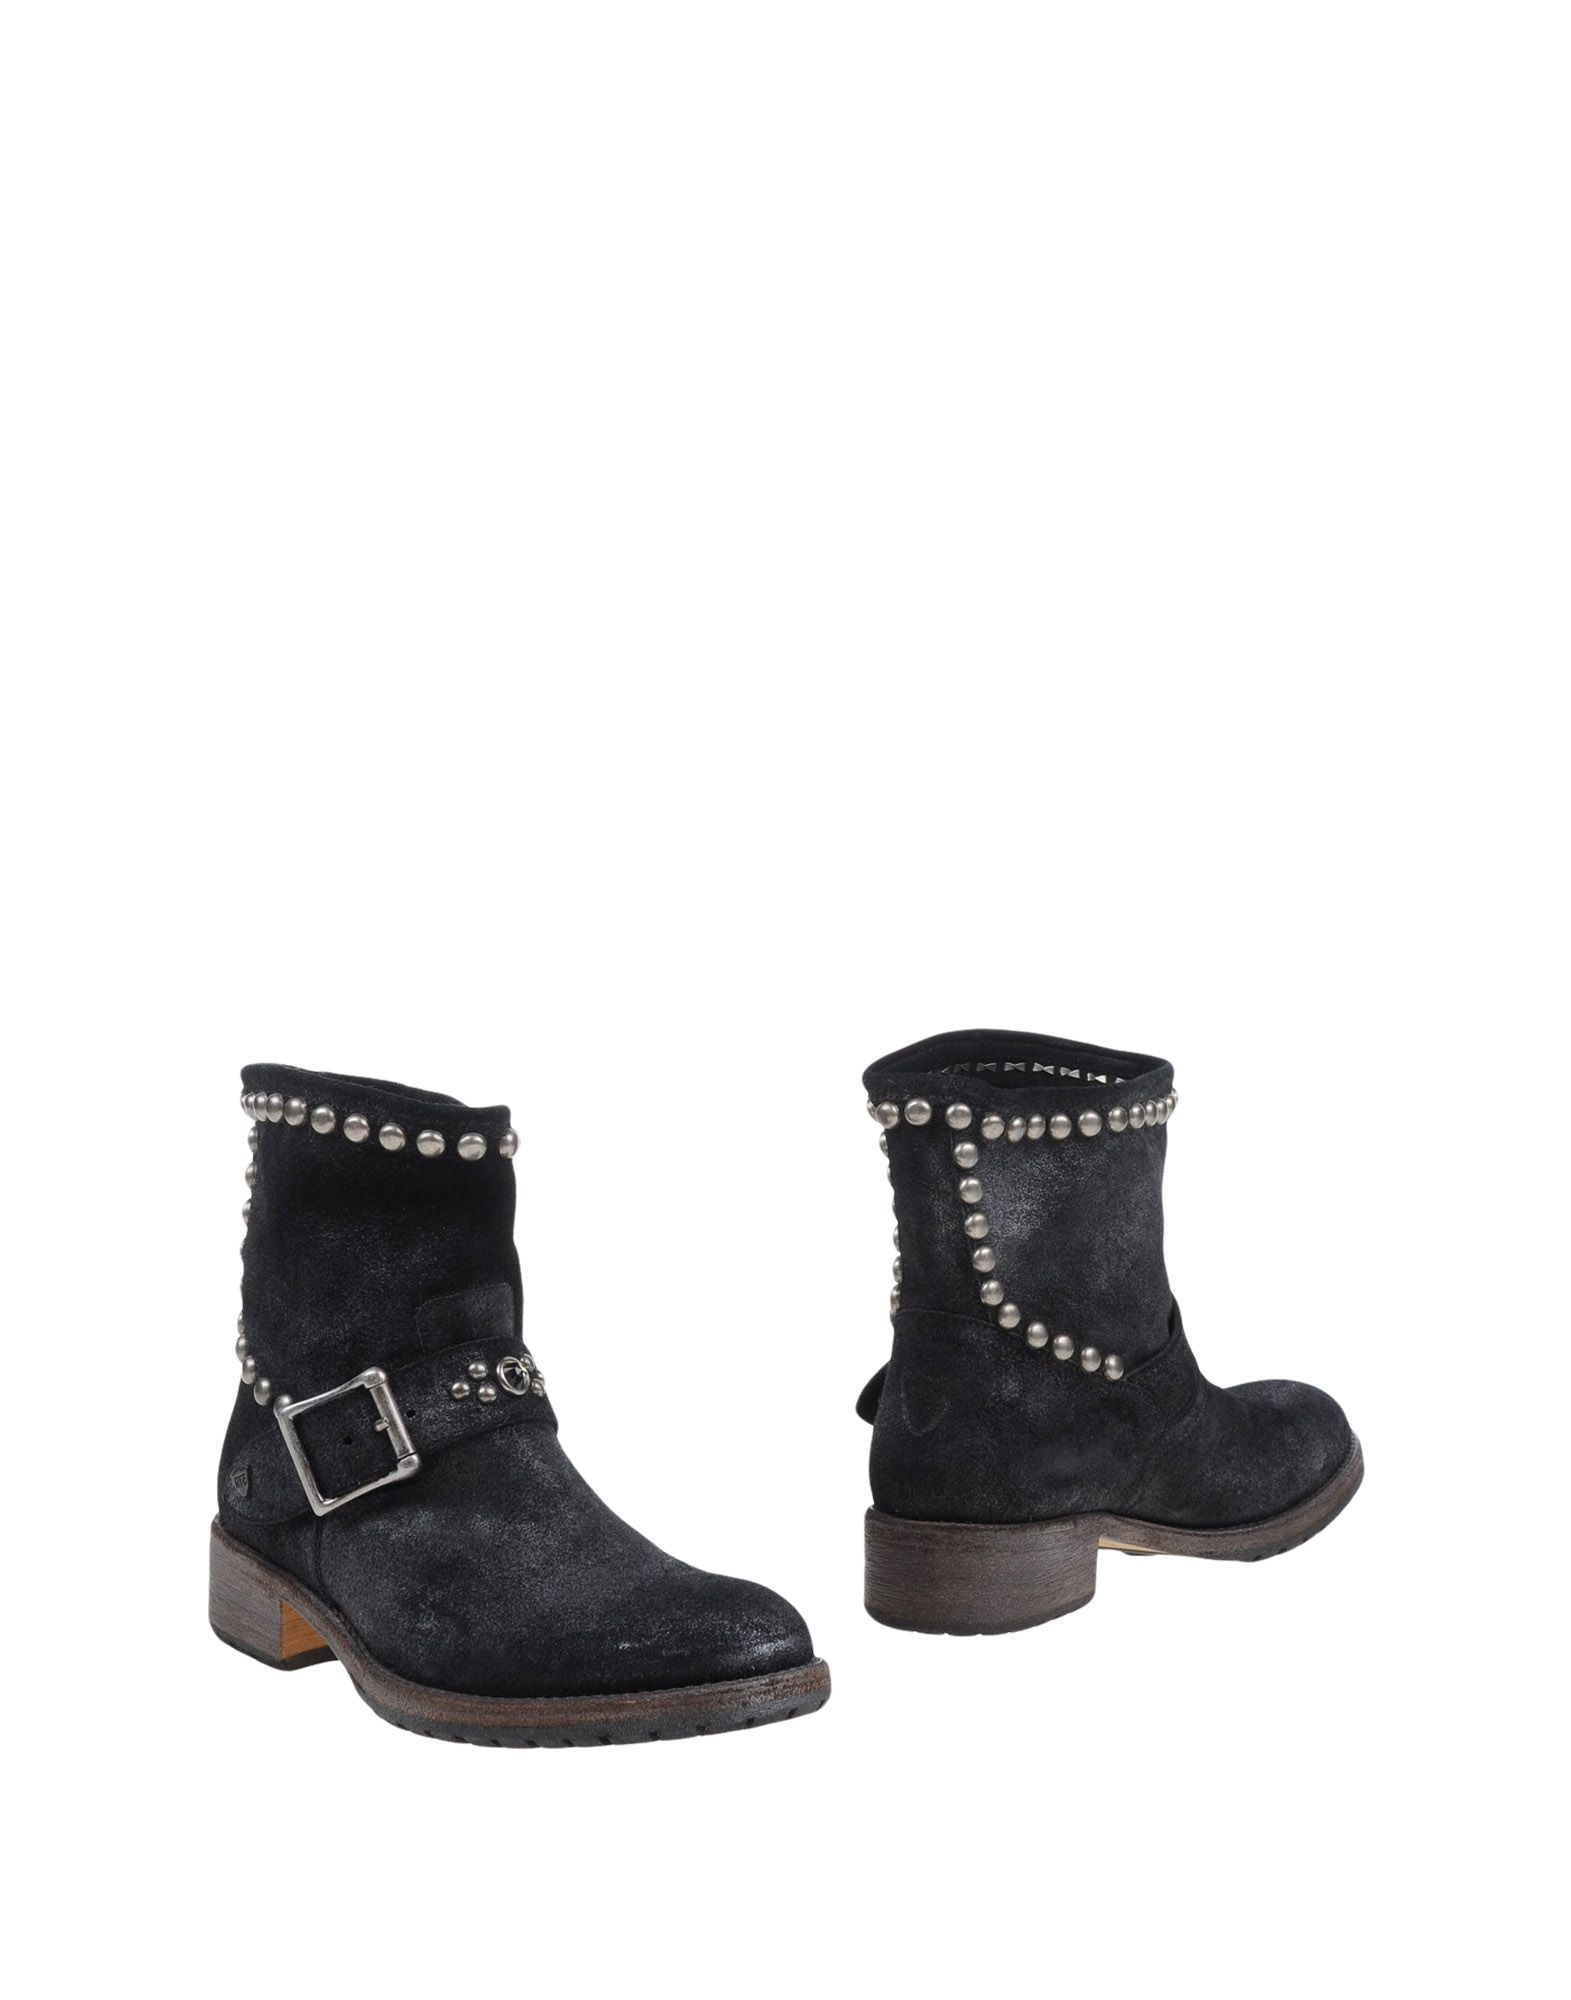 Htc Ankle Ankle Boot - Women Htc Ankle Ankle Boots online on  United Kingdom - 11014123GC e5723a